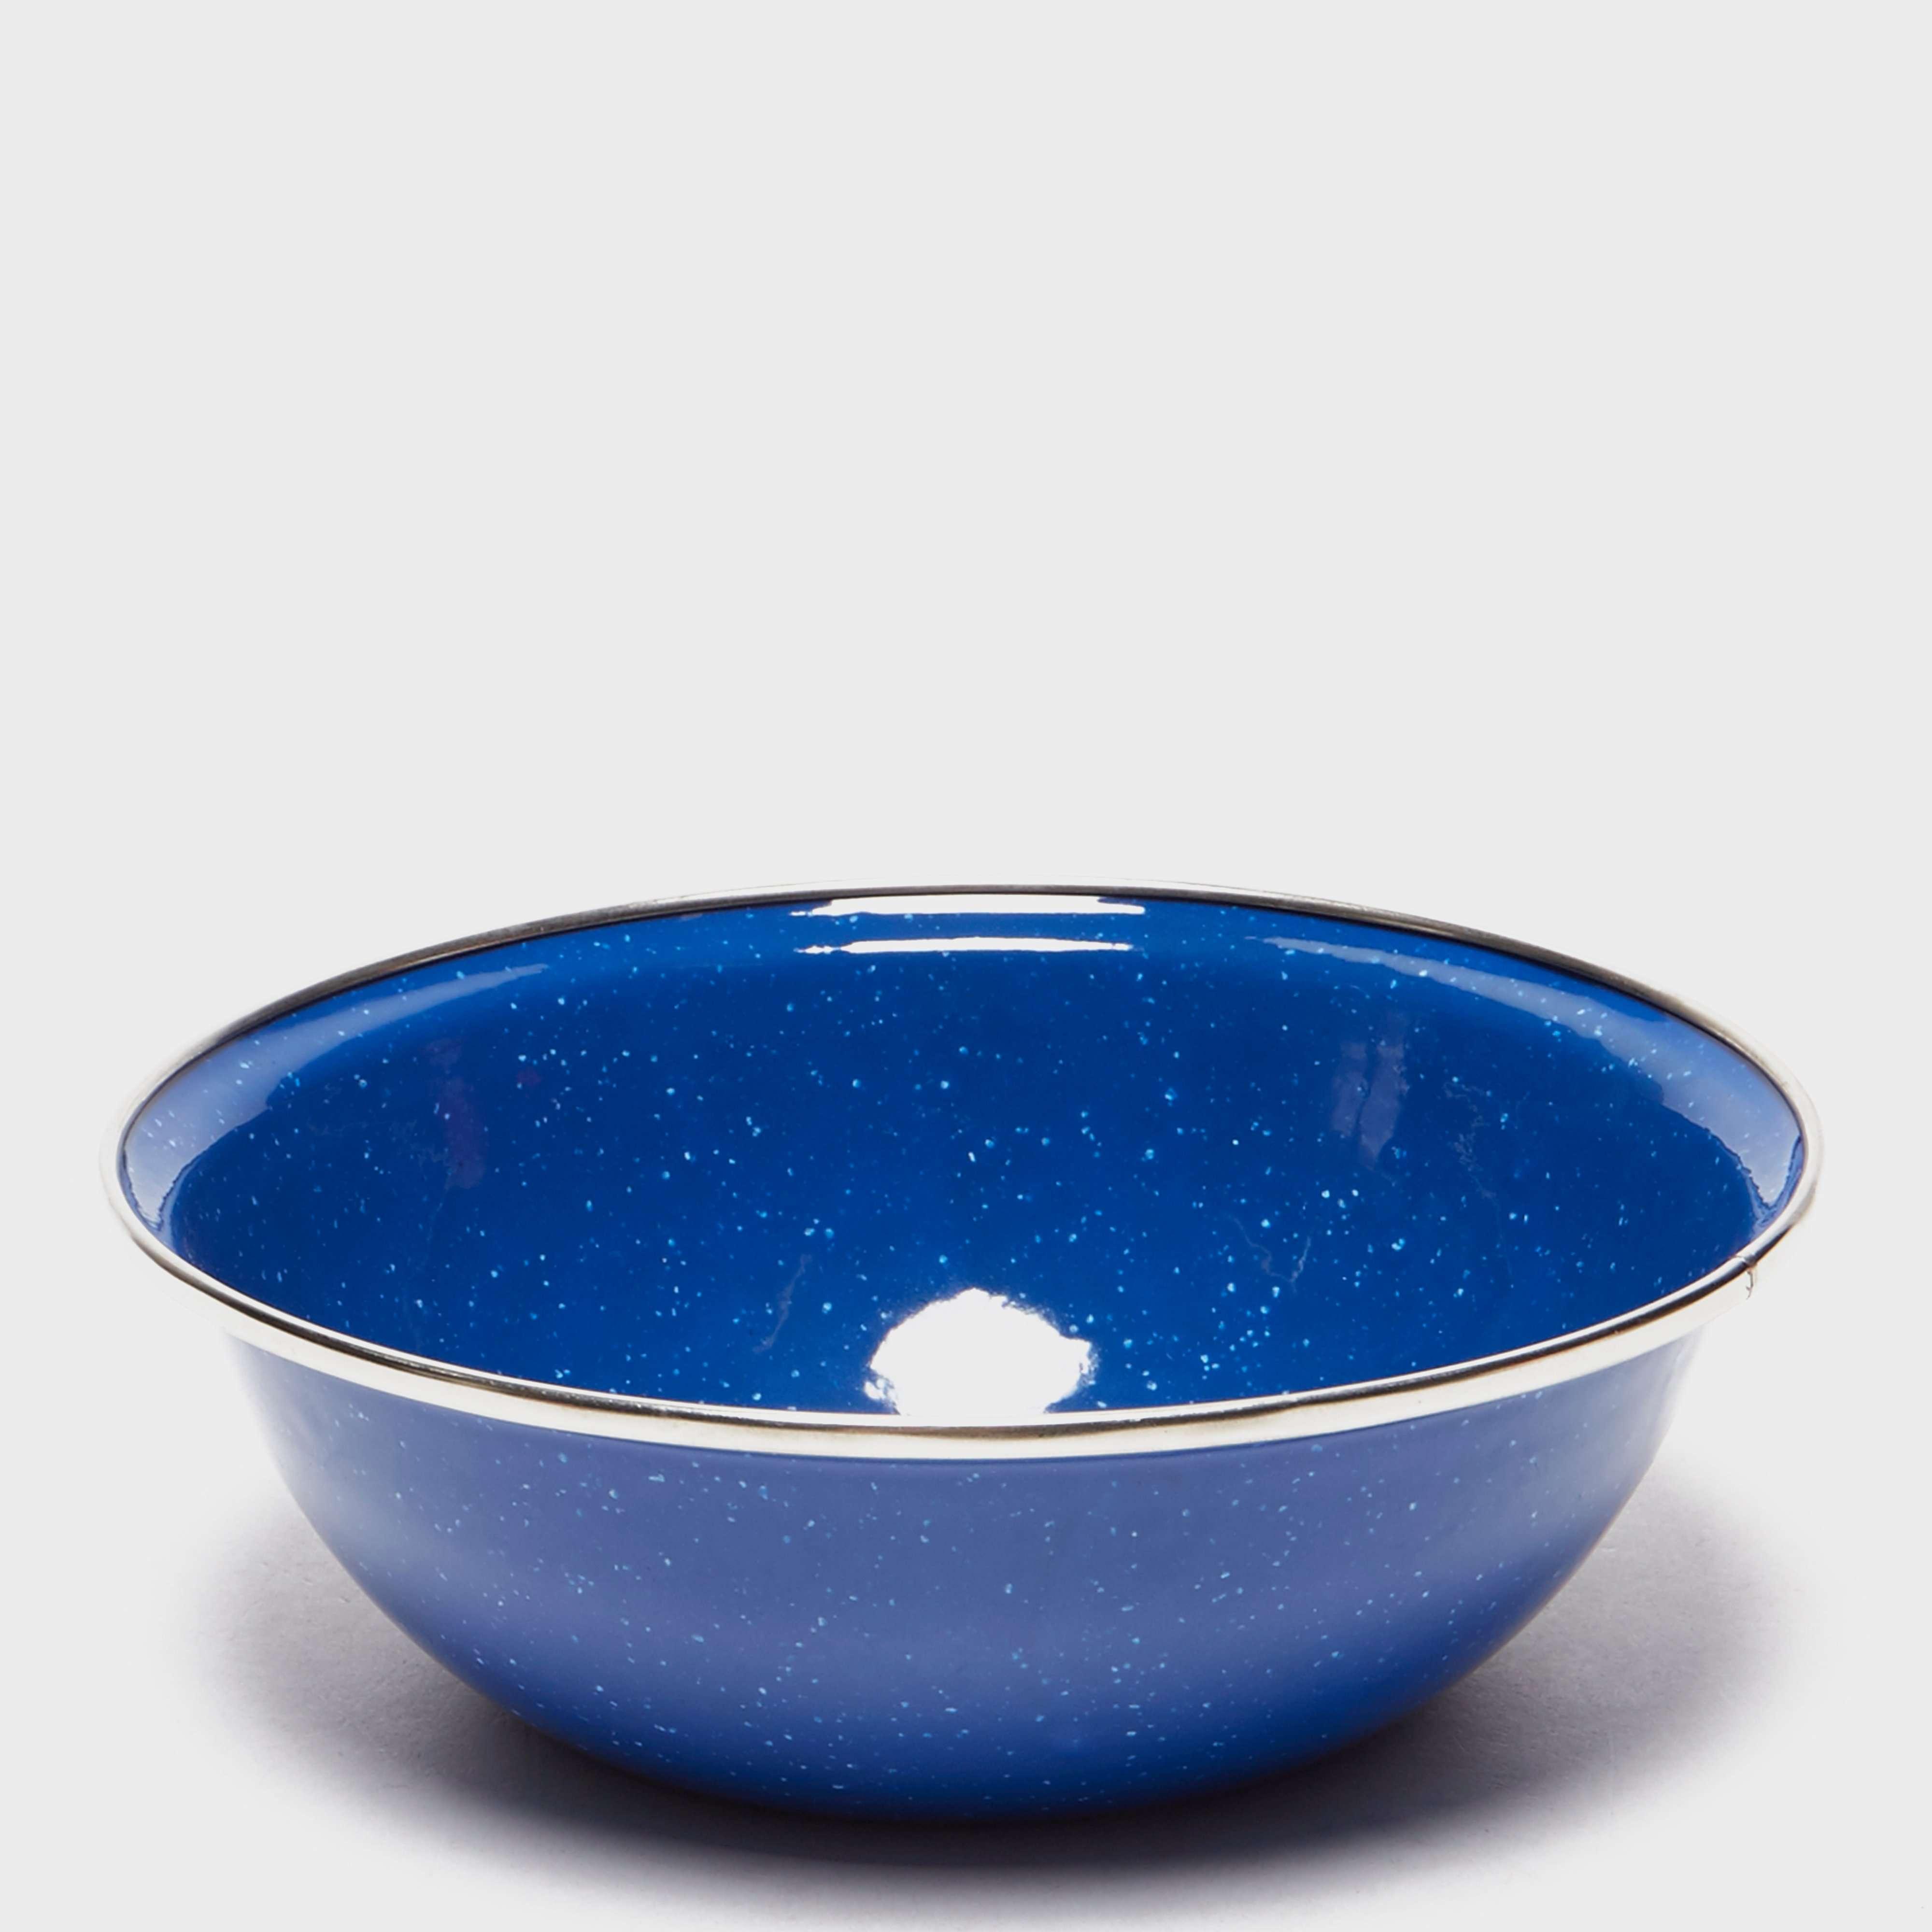 HIGHLANDER Deluxe 16cm Enamel Bowl